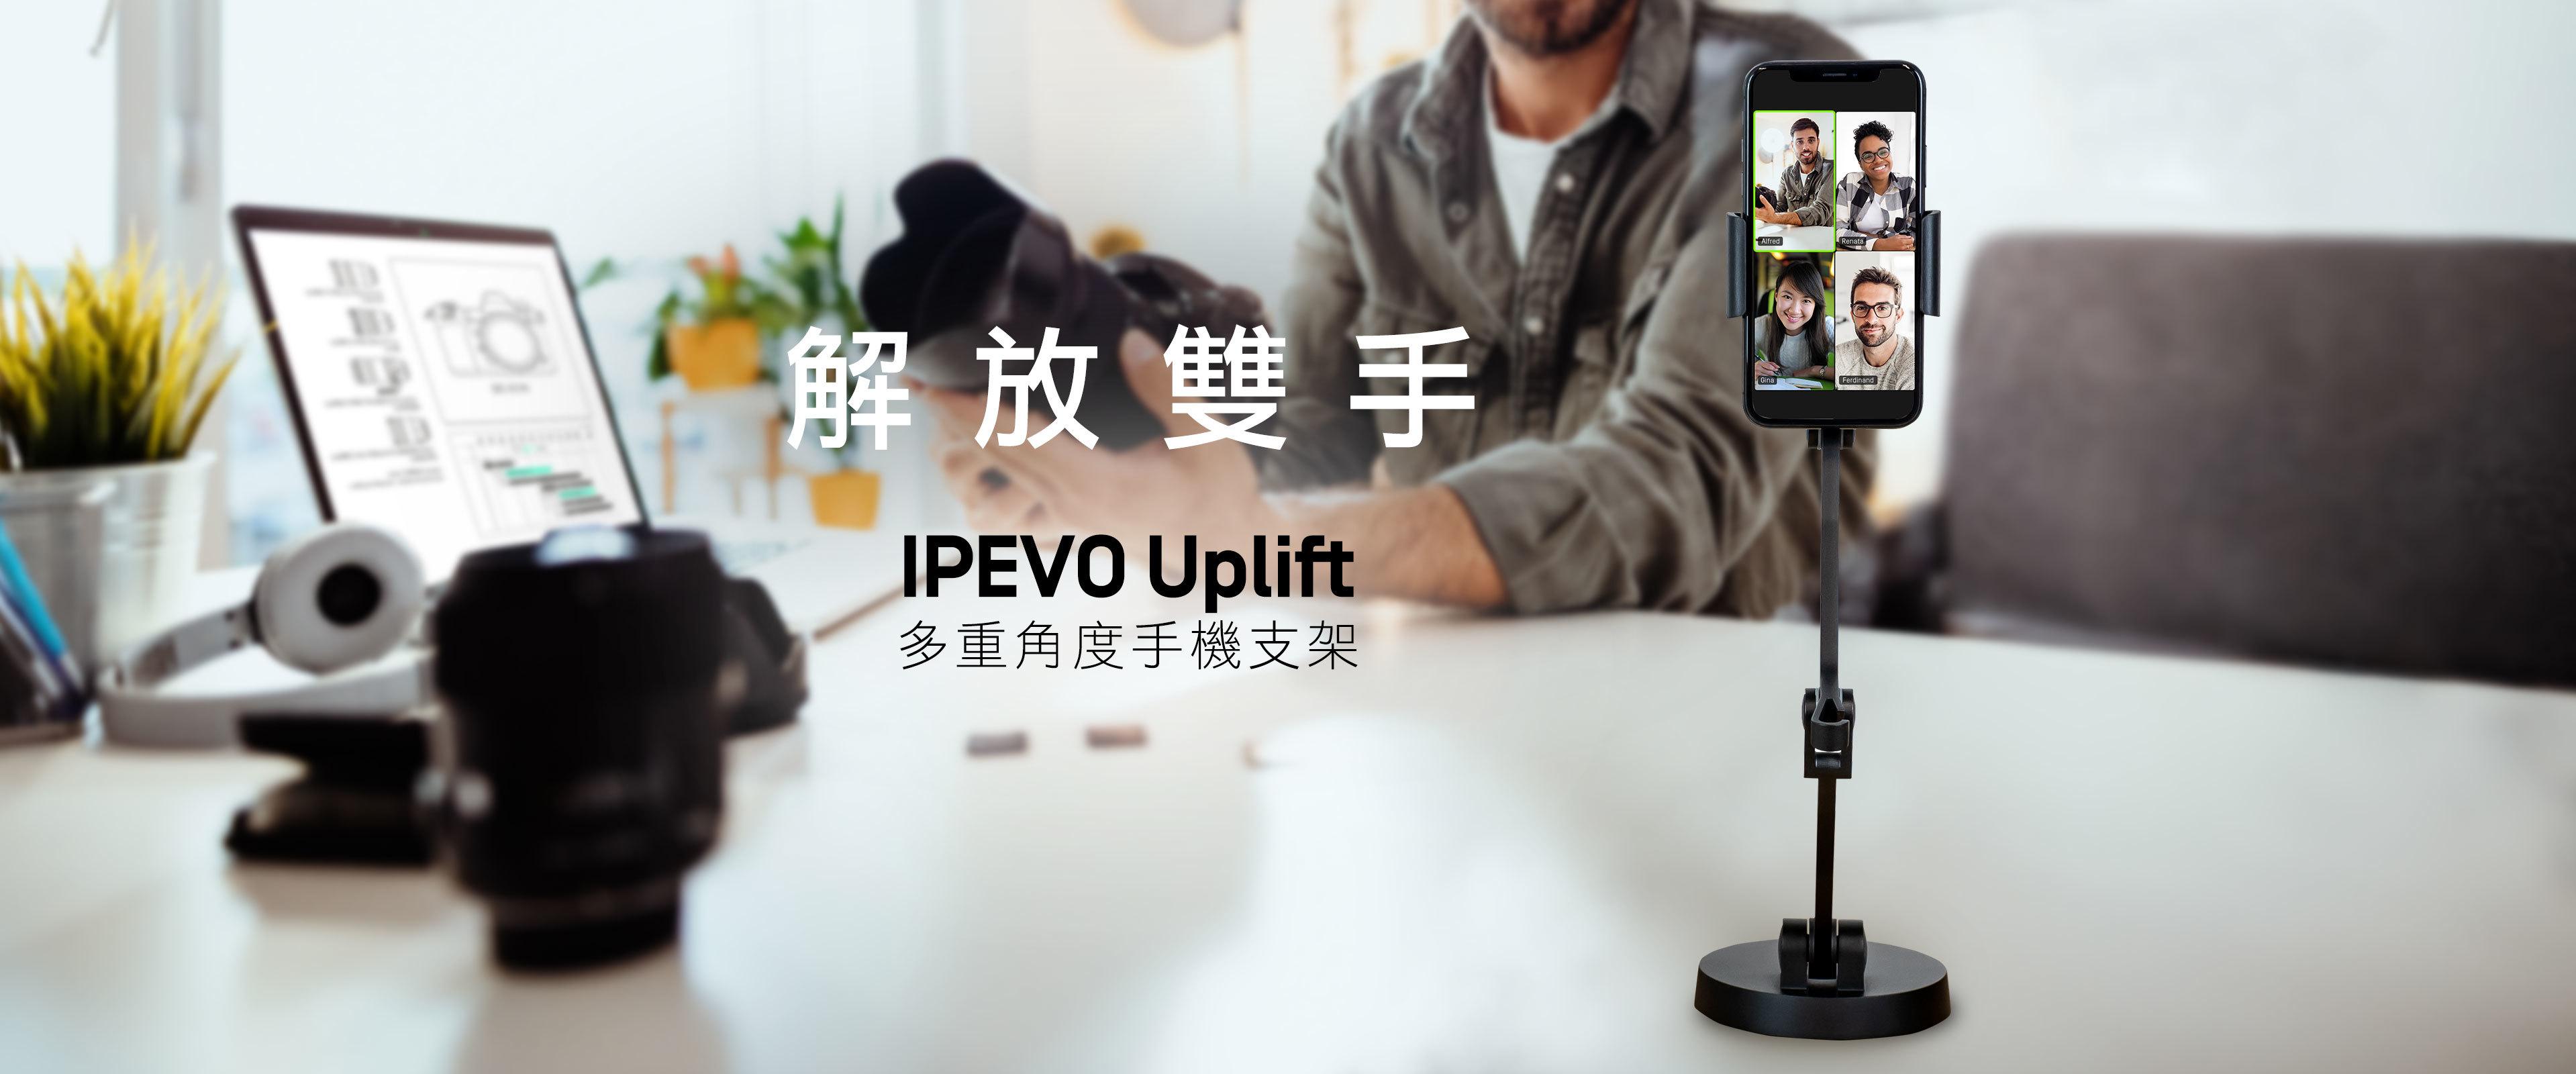 IPEVO Uplift 多重角度手機支架